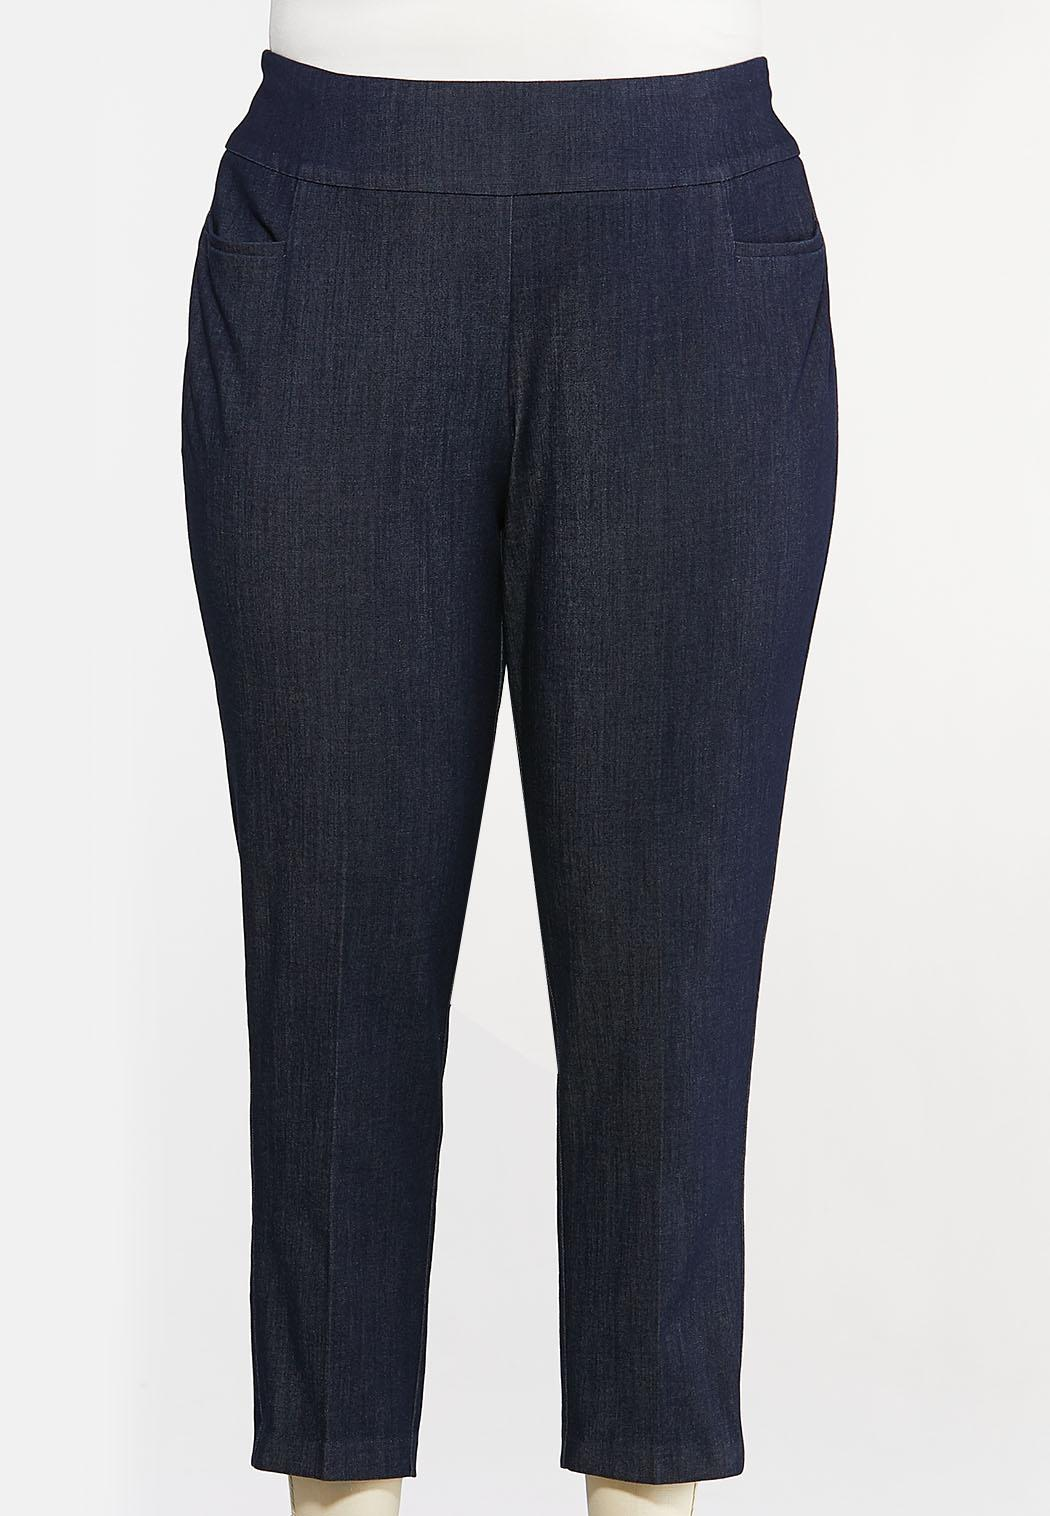 Plus Size Dressy Denim Pants